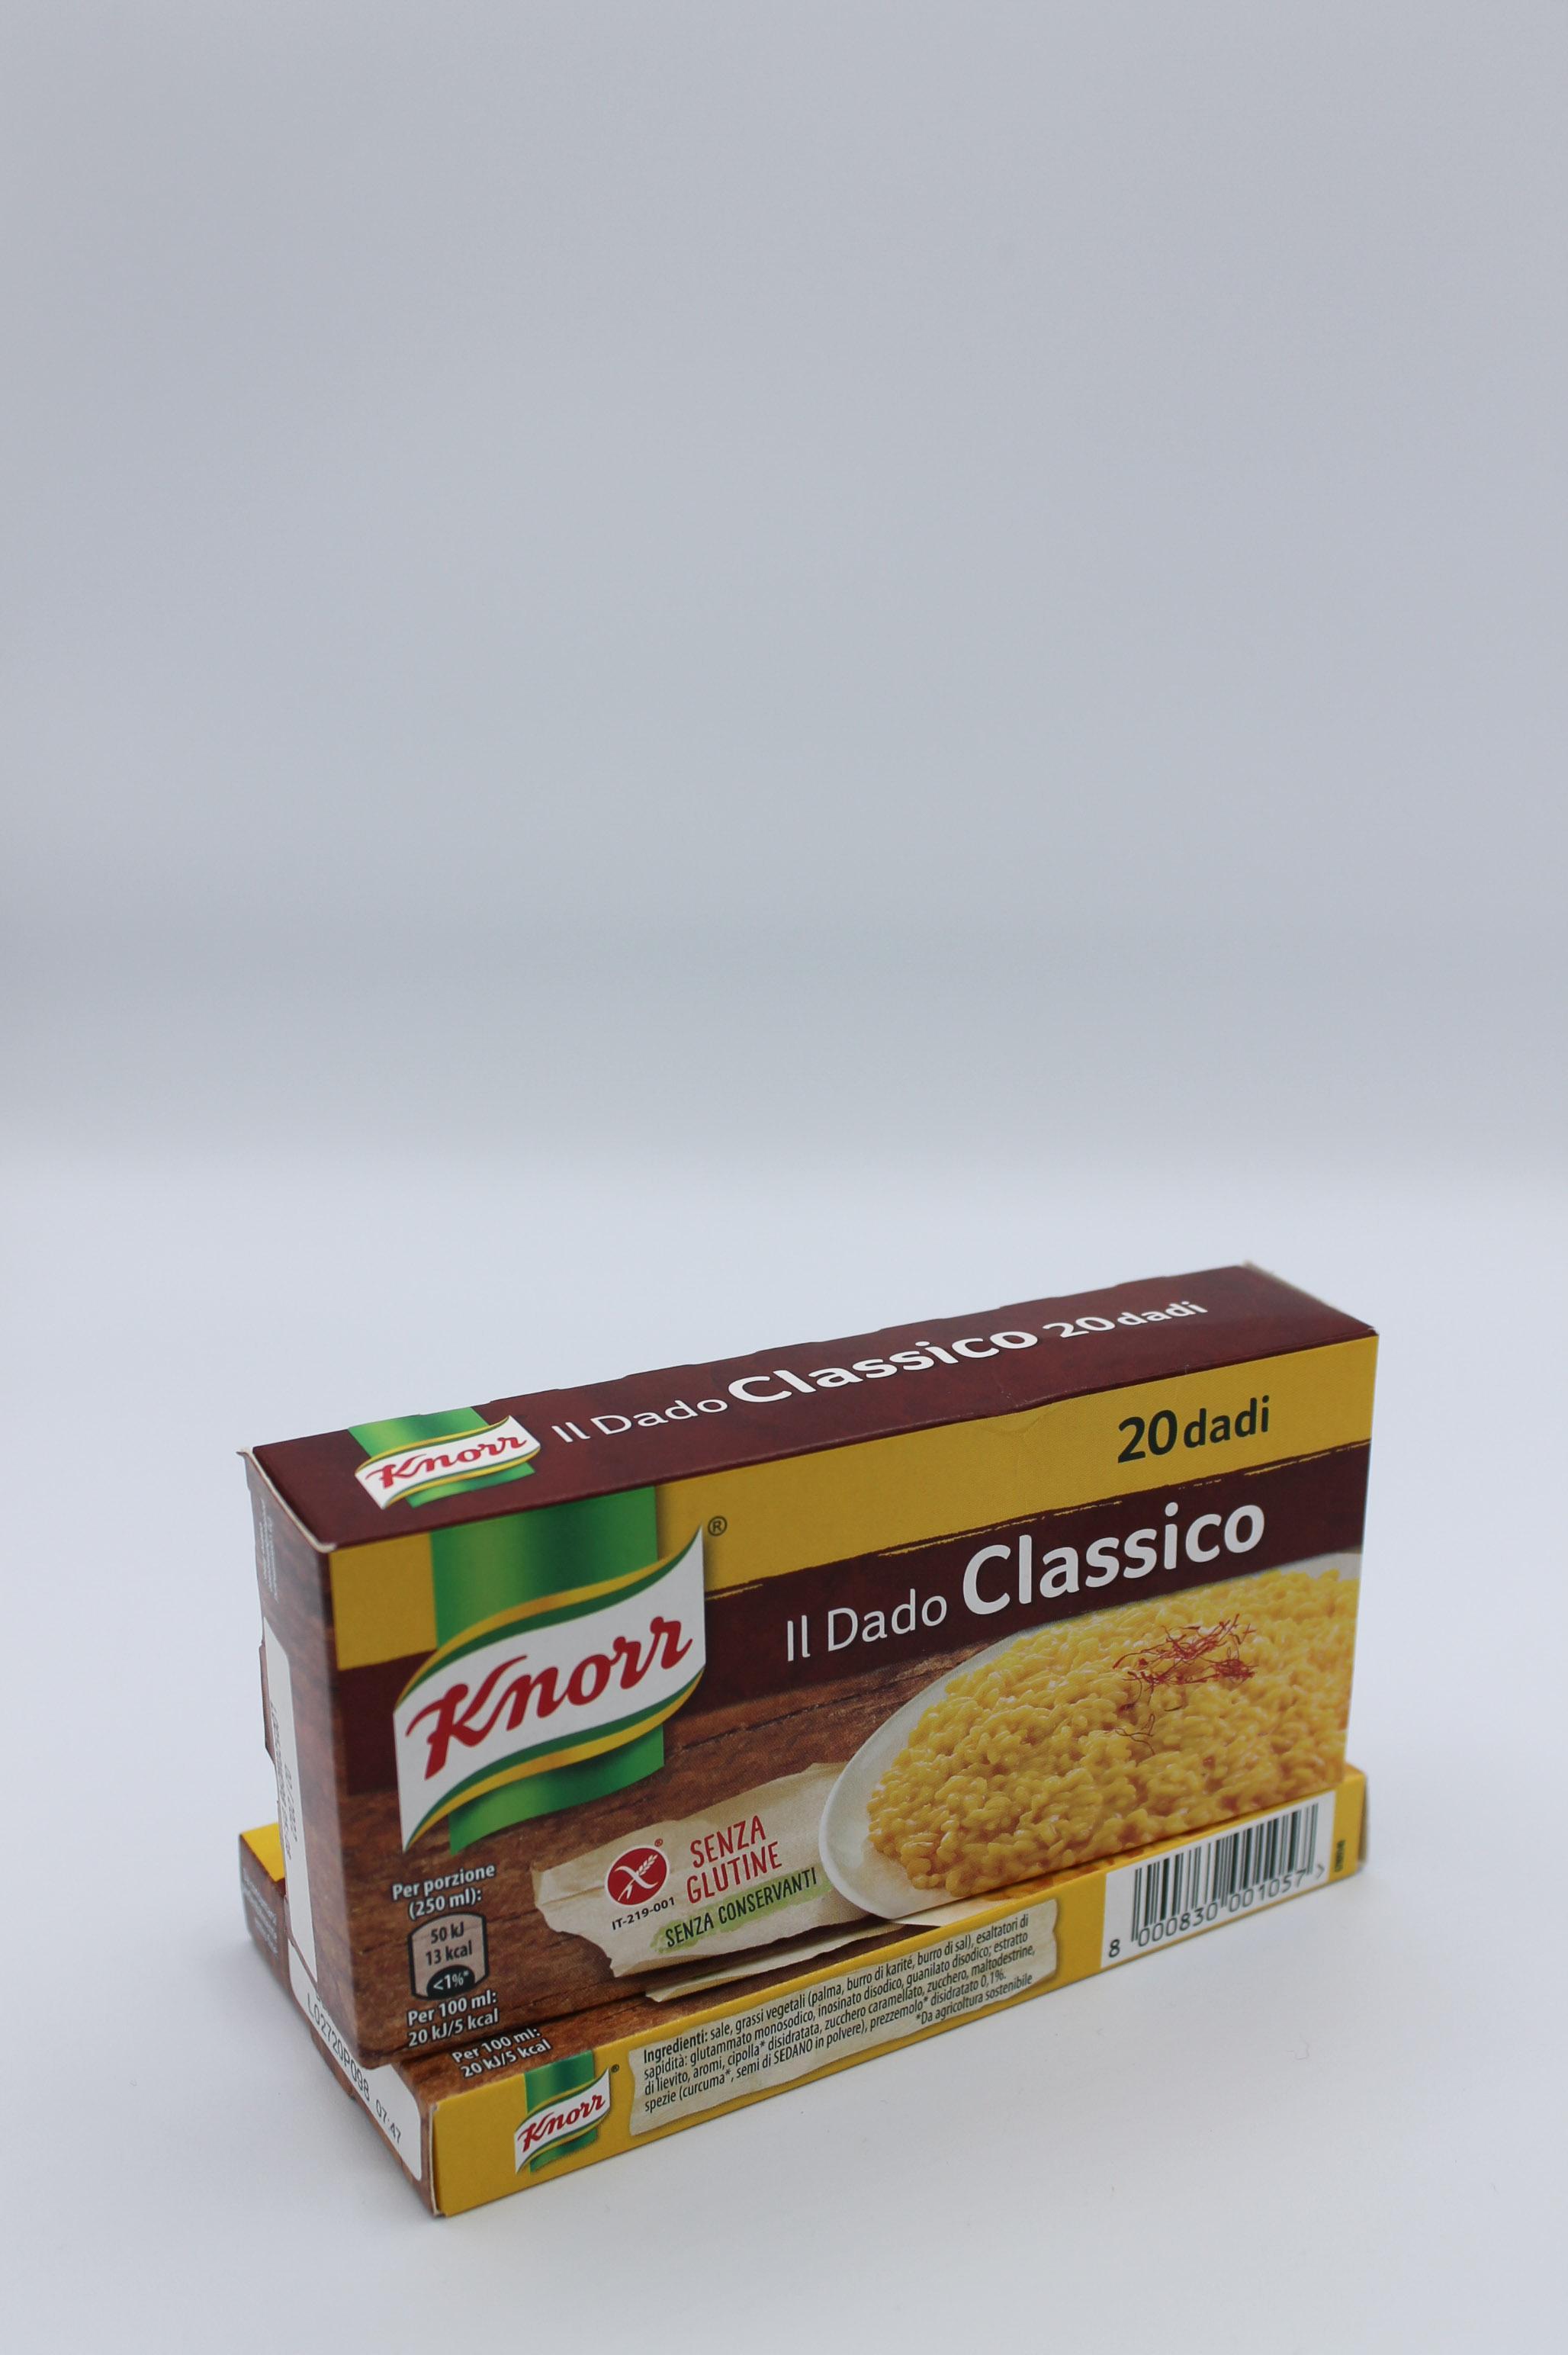 Knorr dado classico 200 gr.